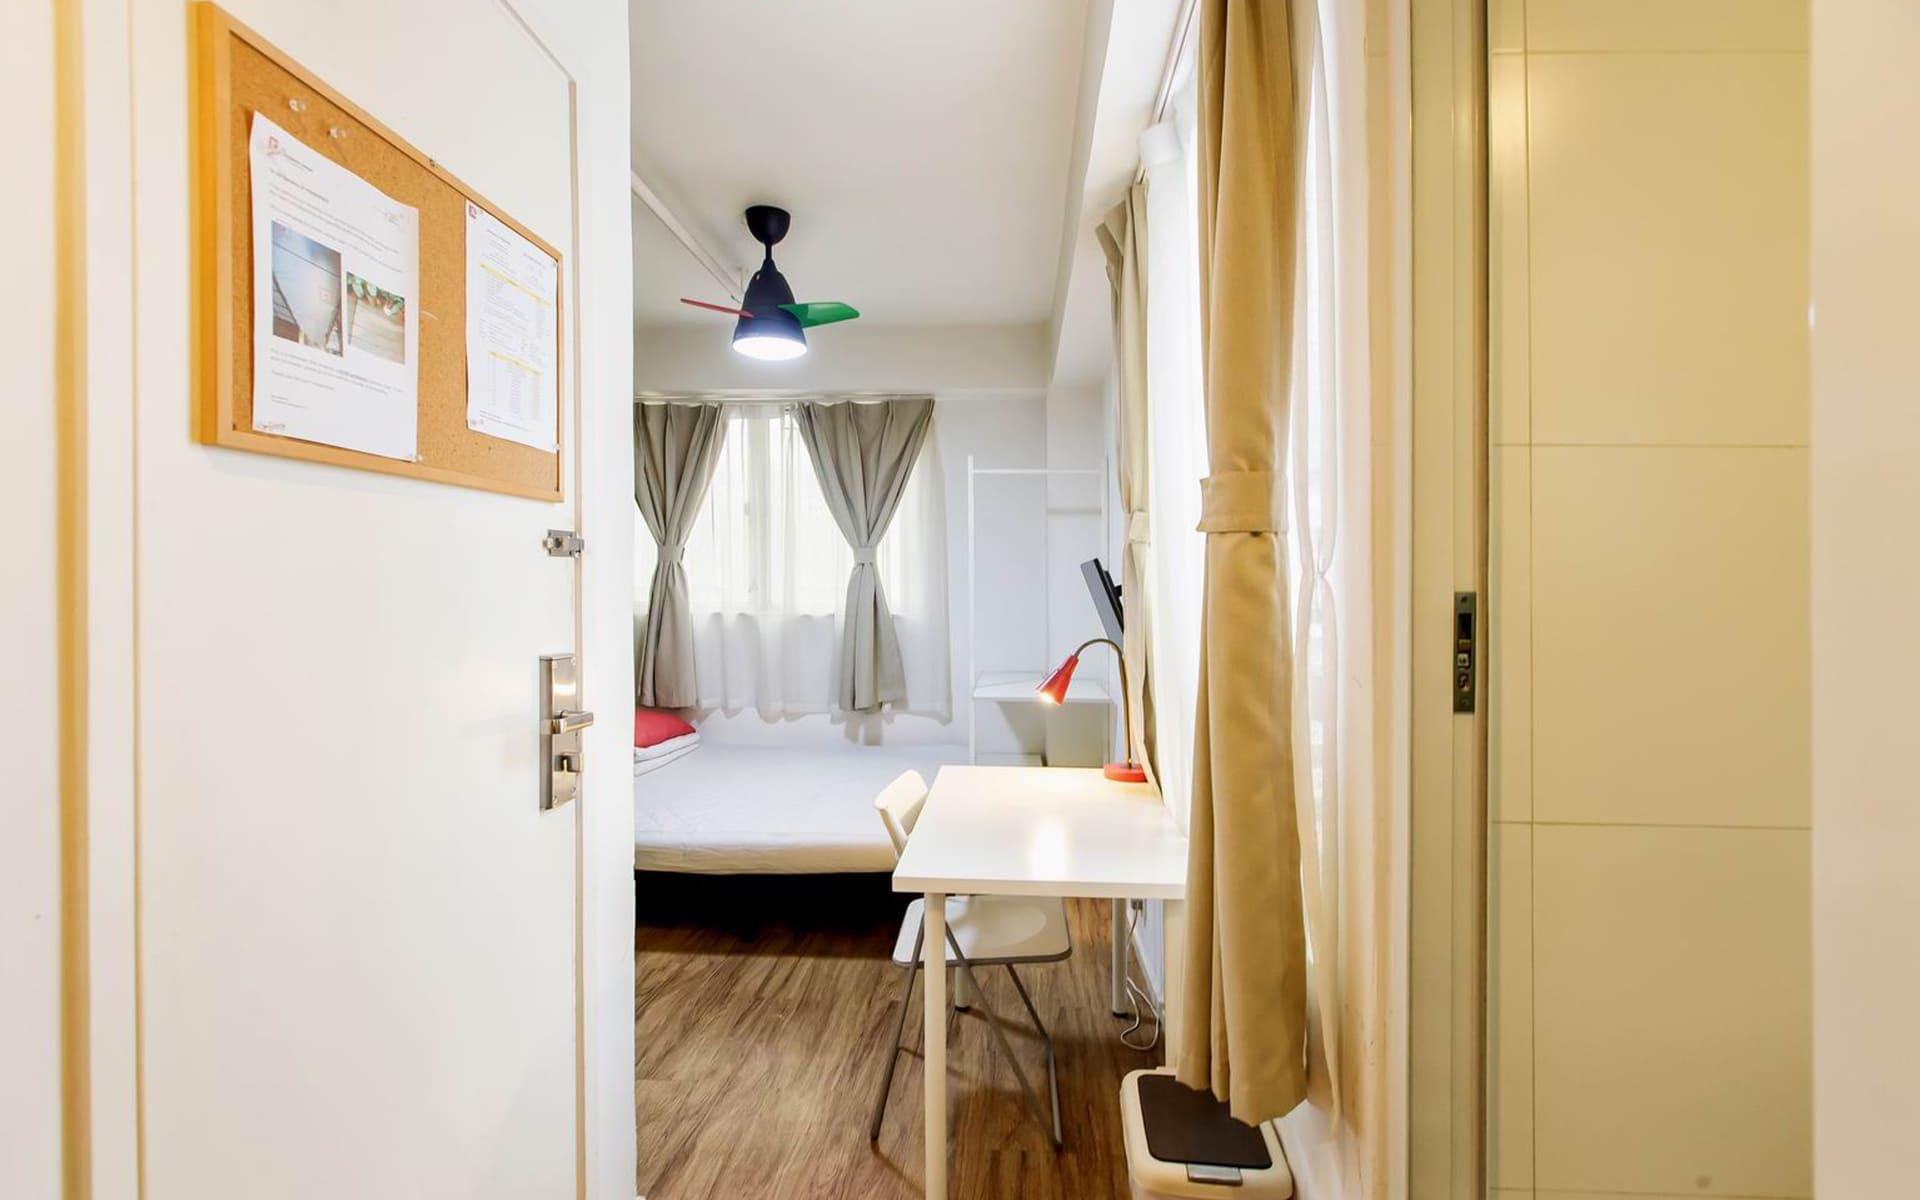 hk_service_apartment_13394752871596694984.jpg